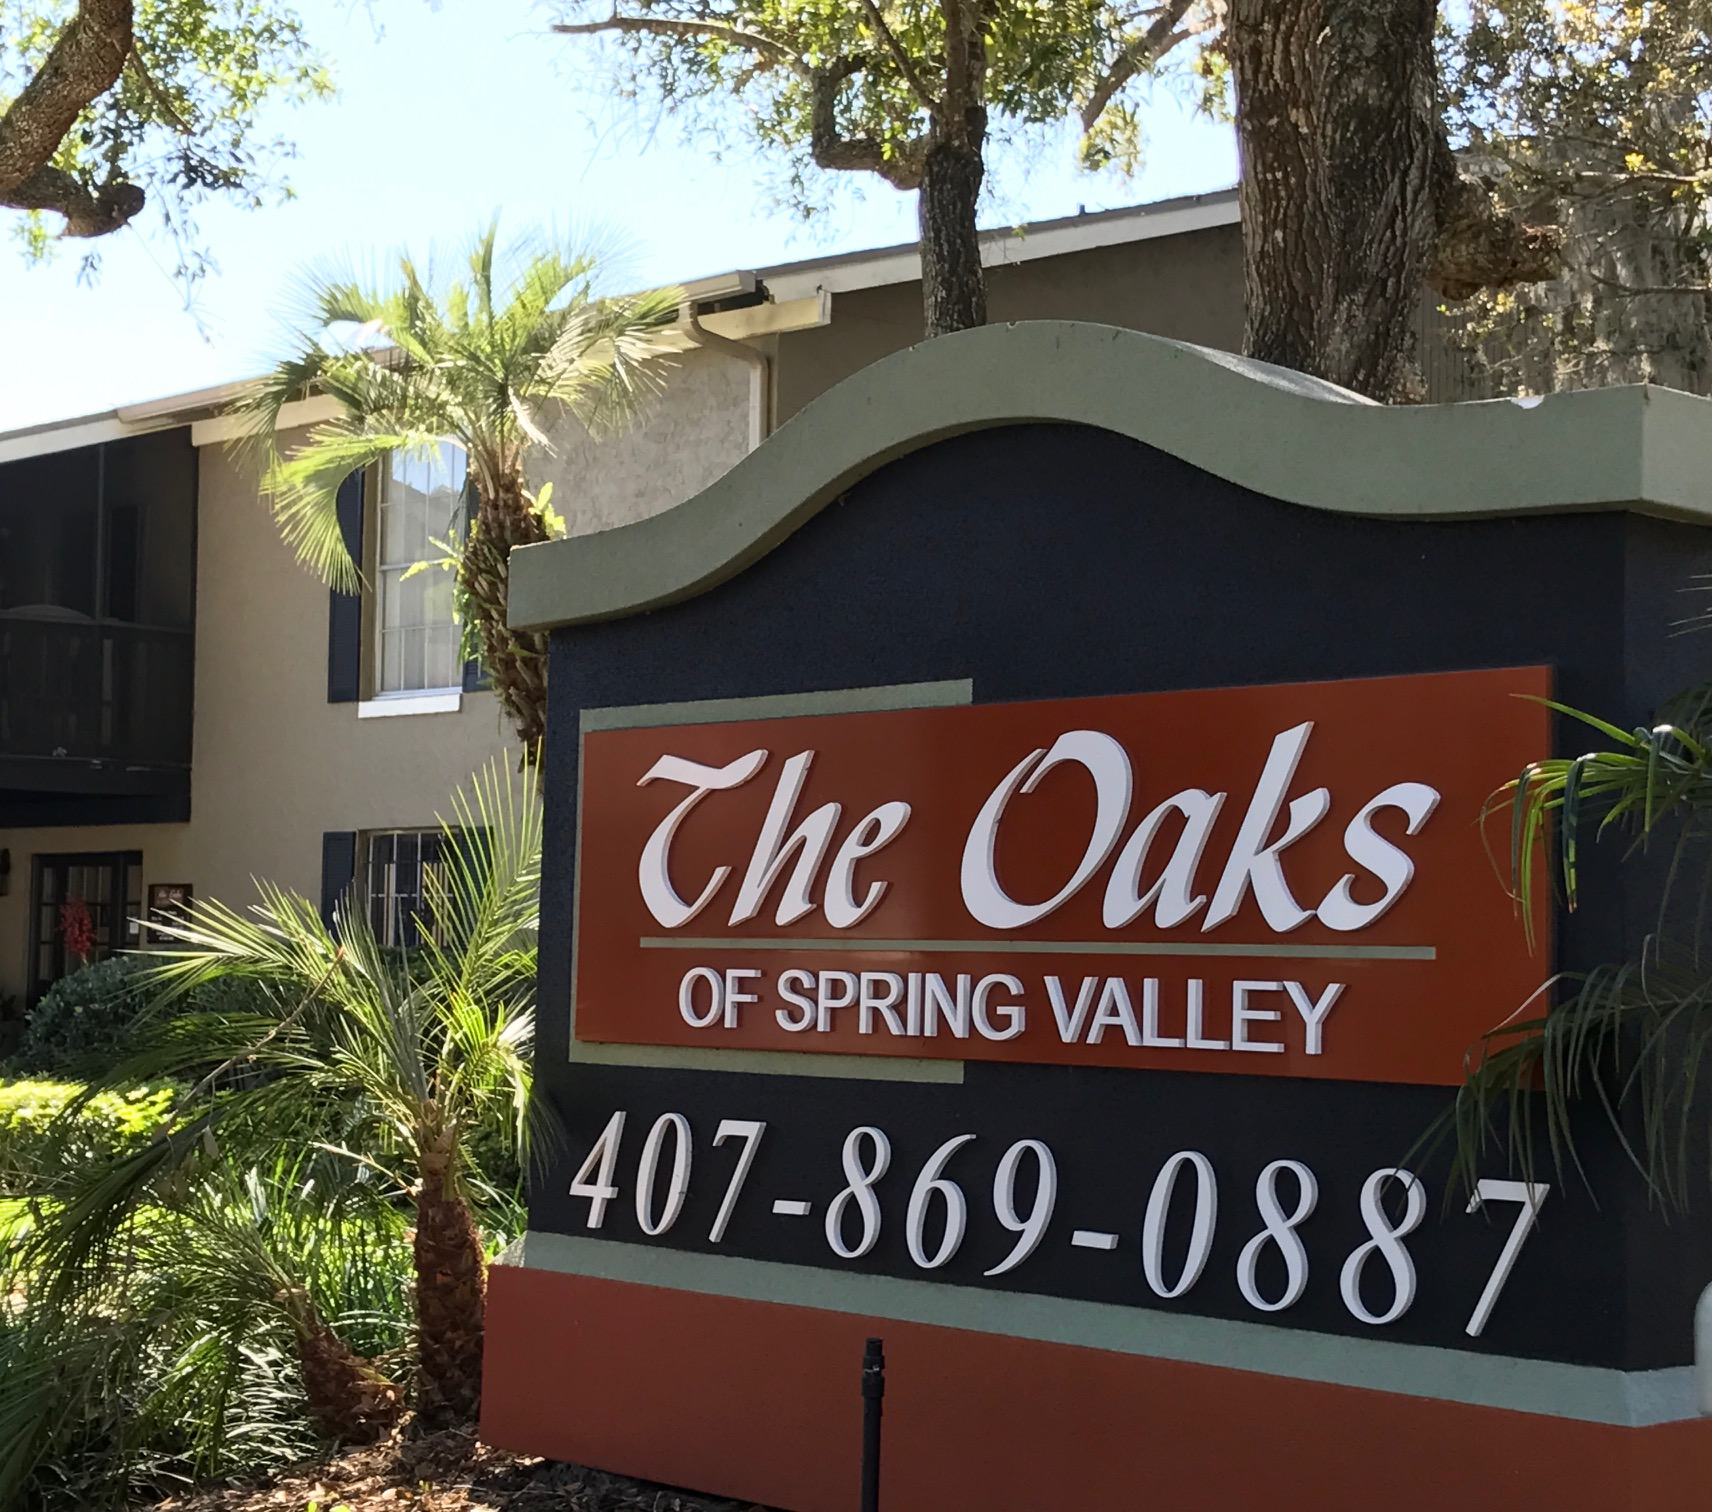 Oaks of Spring Valley